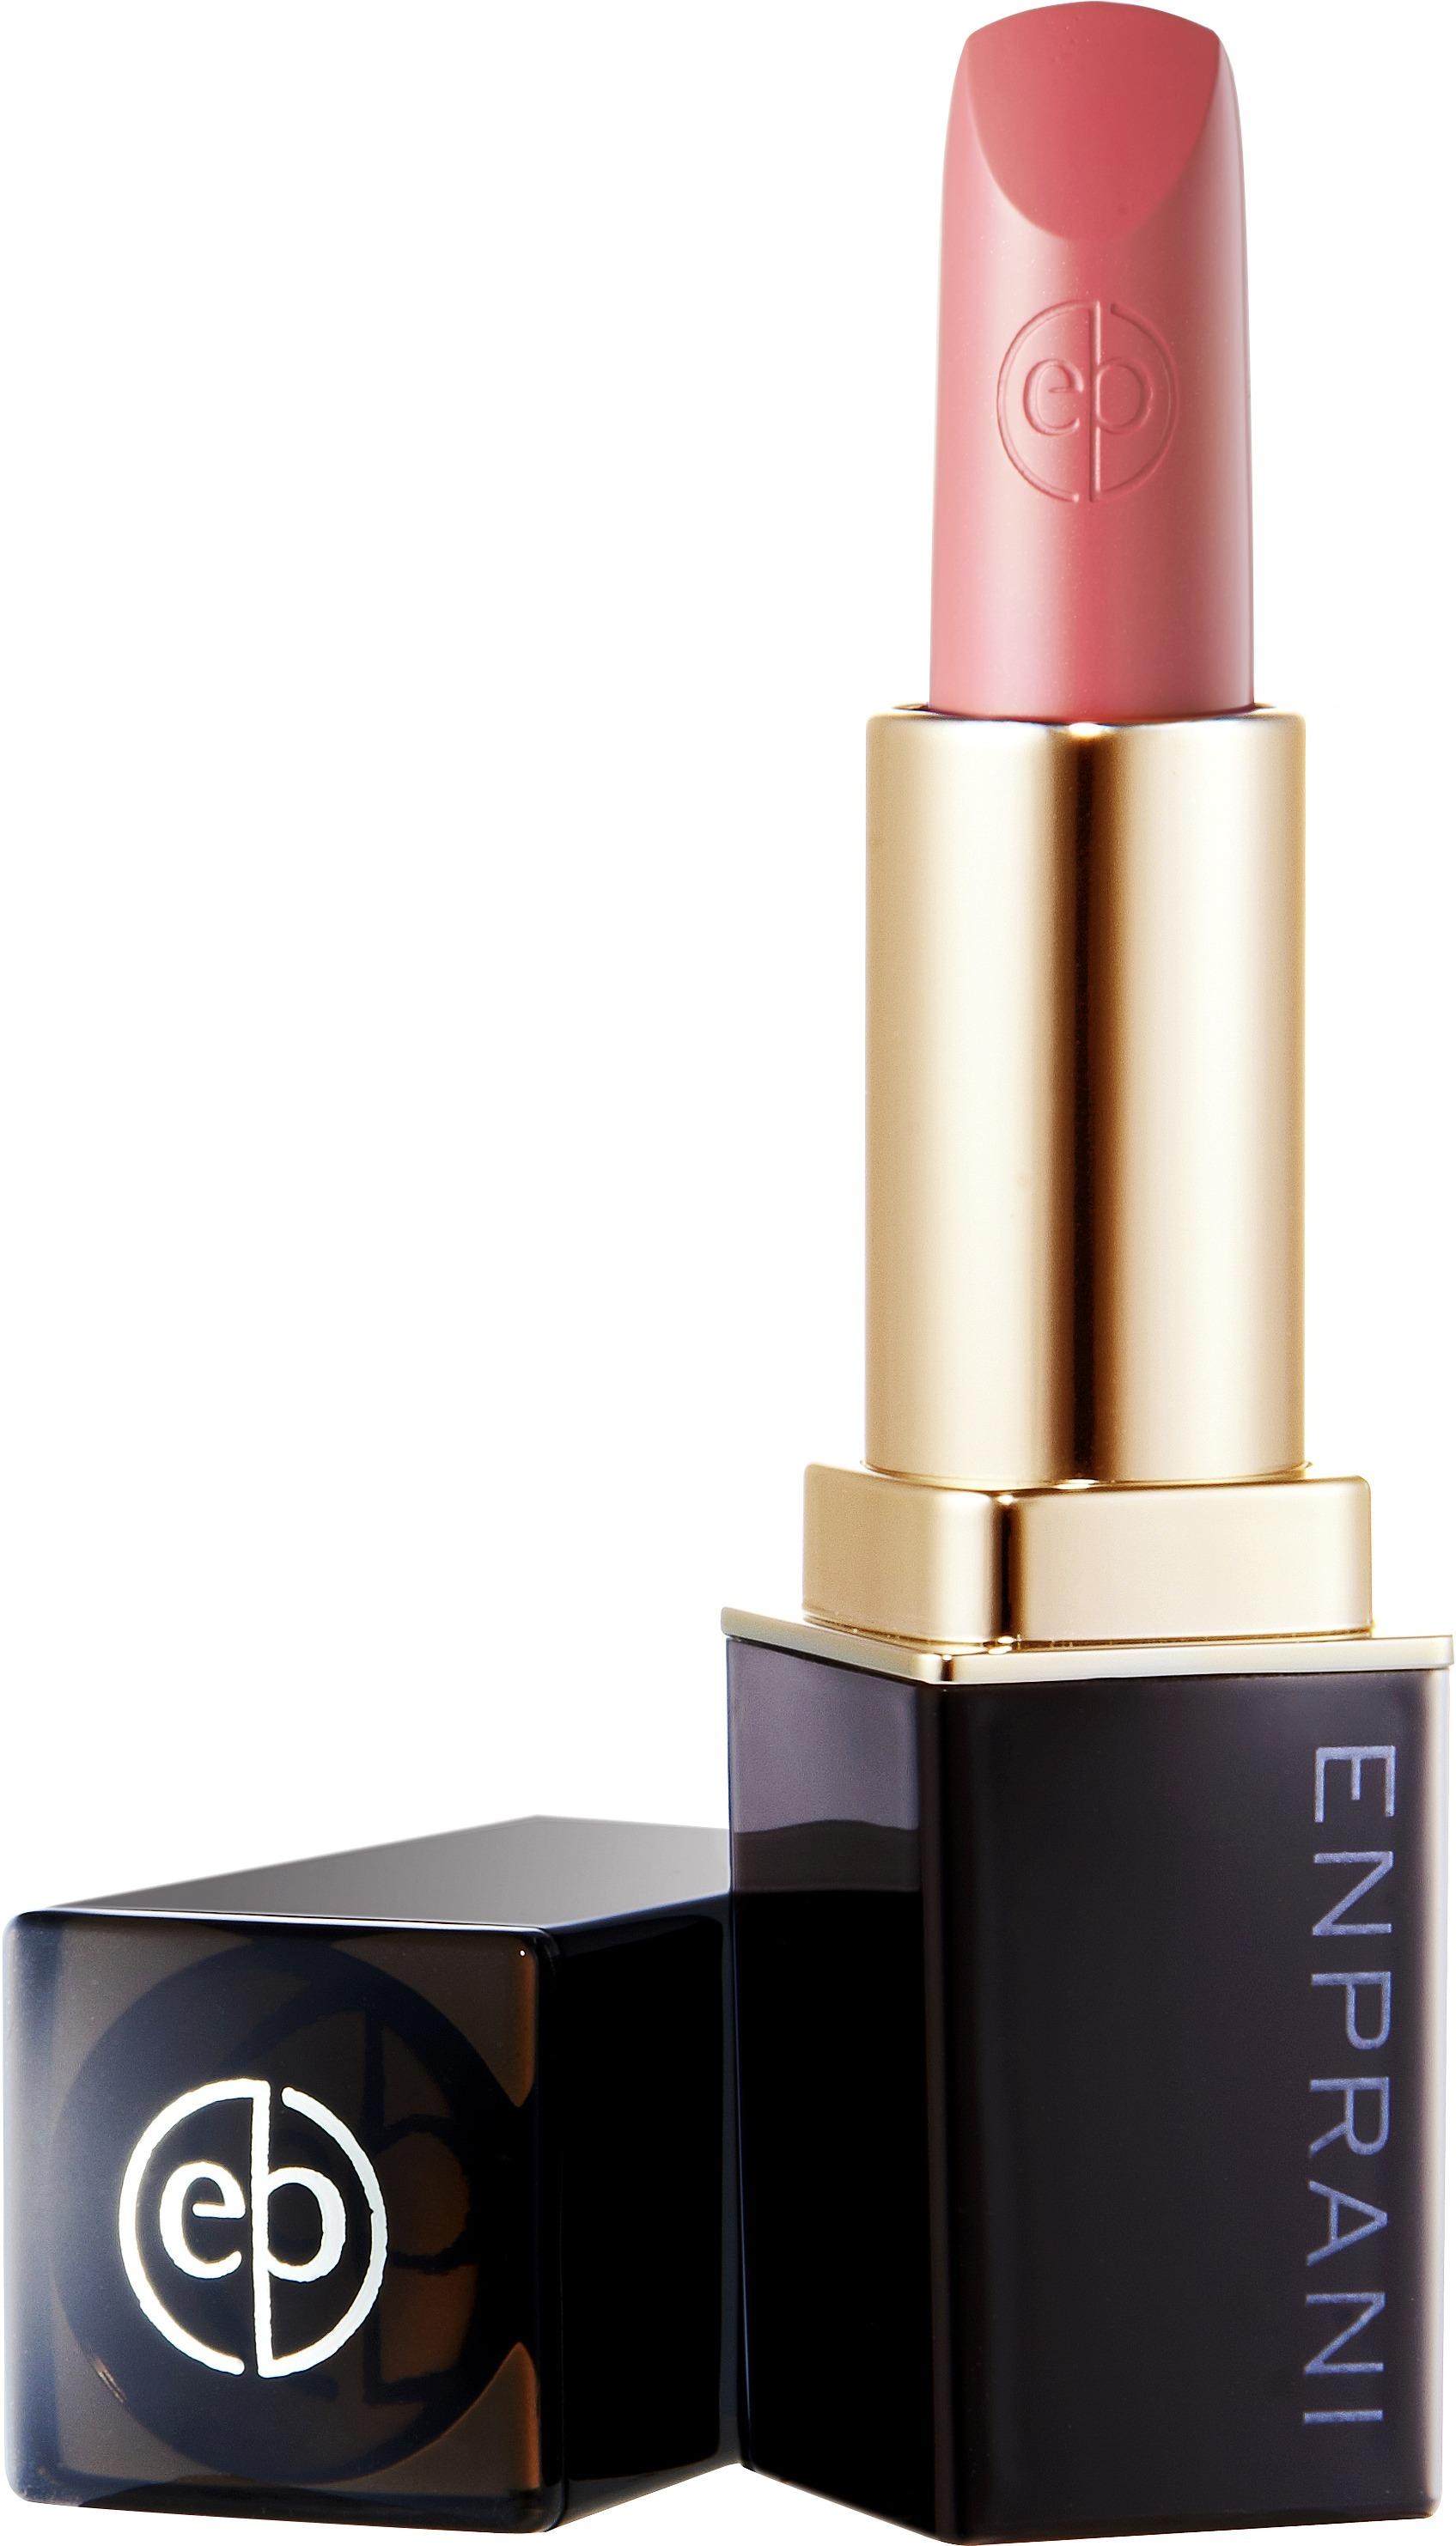 Увлажняющая помада «Нежное сияние» Enprani Delicate Luminous Lipstick